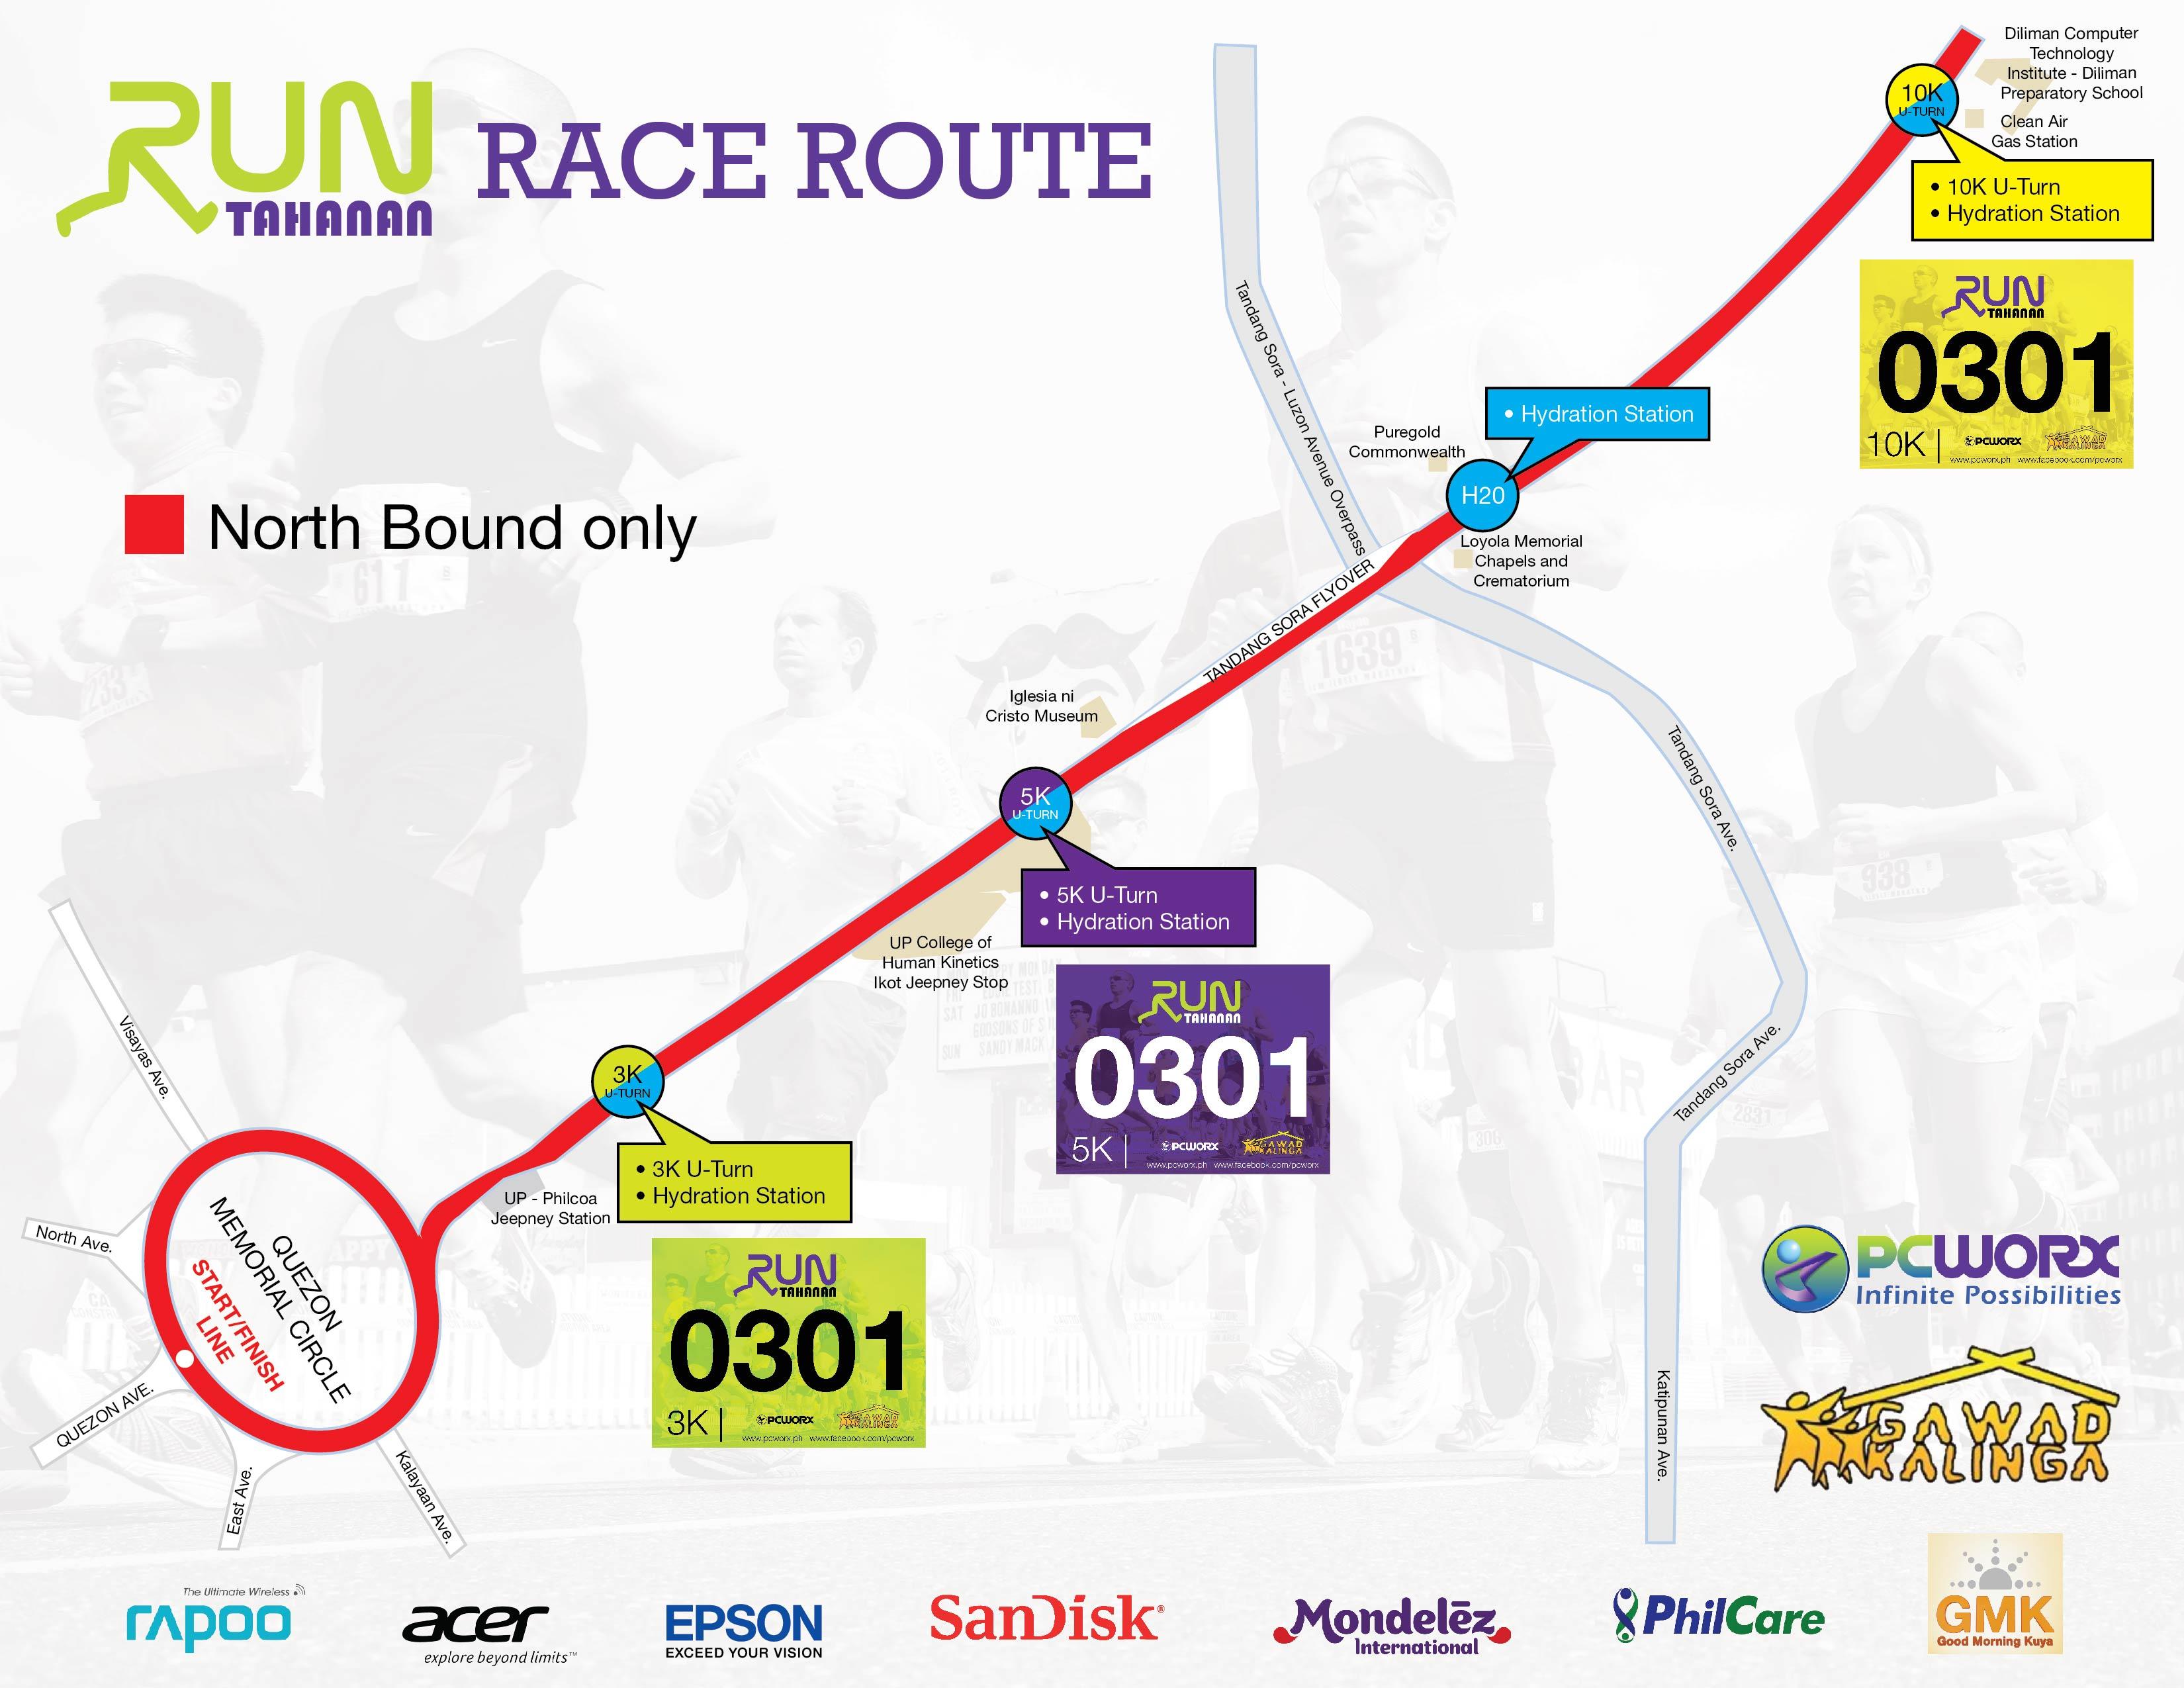 run-tahanan-2014-route-map